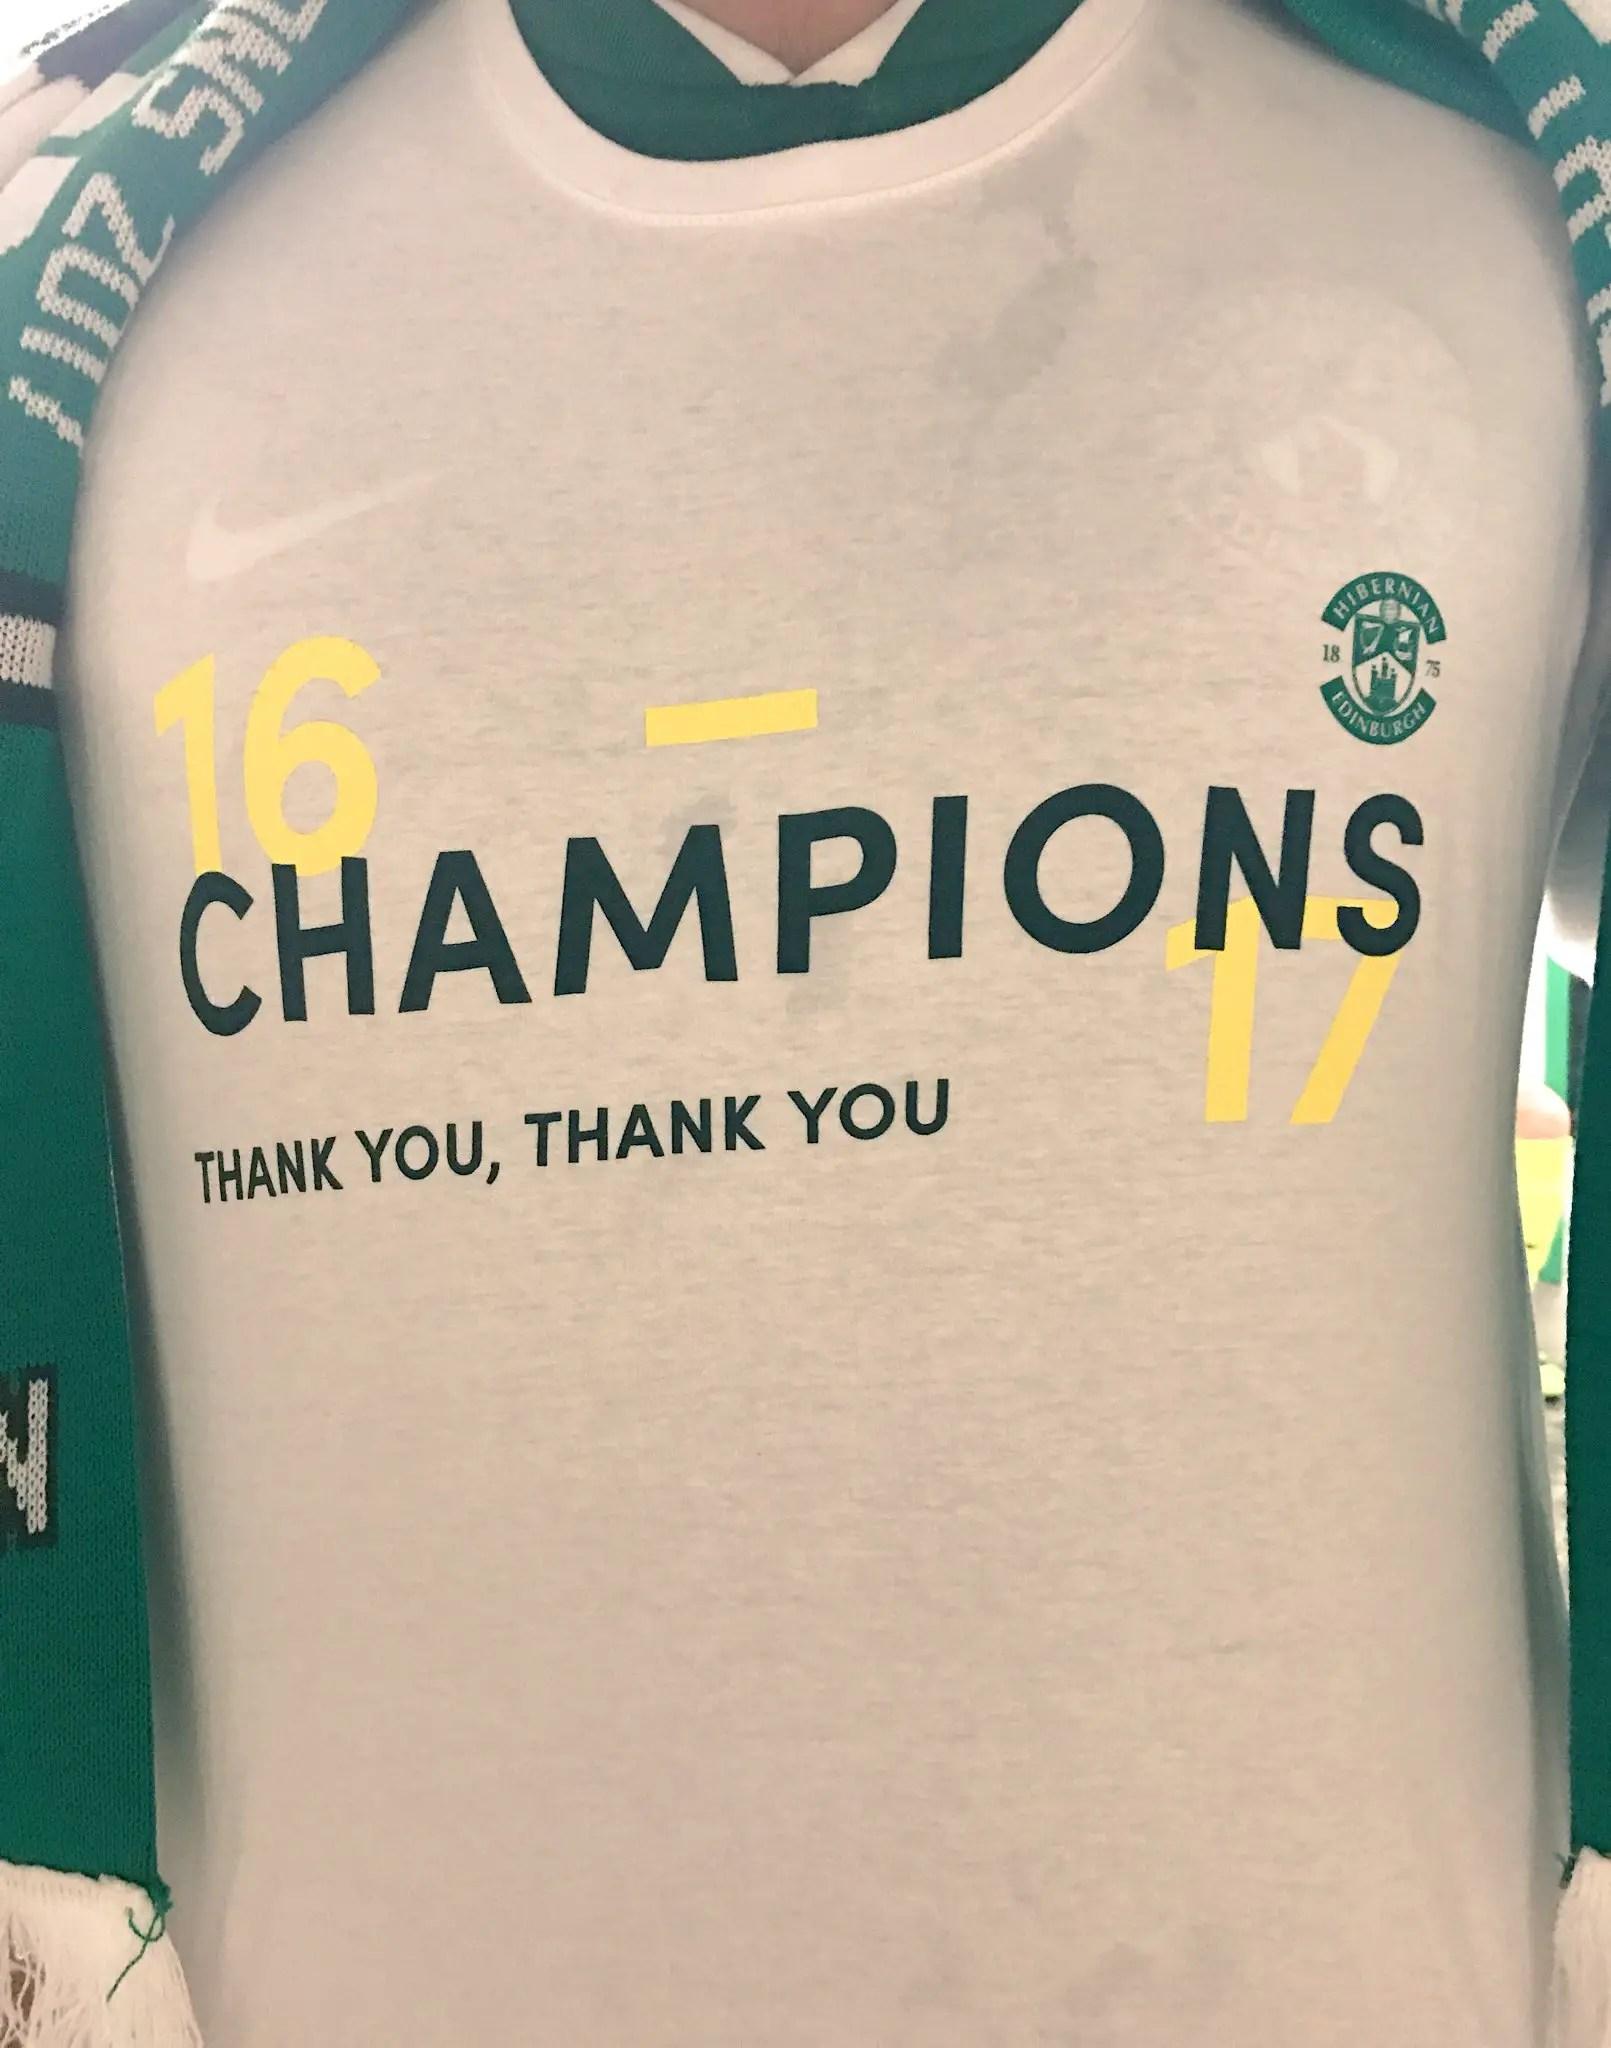 Ambrose Clinches Scottish Championship Title, Promotion With Hibernian